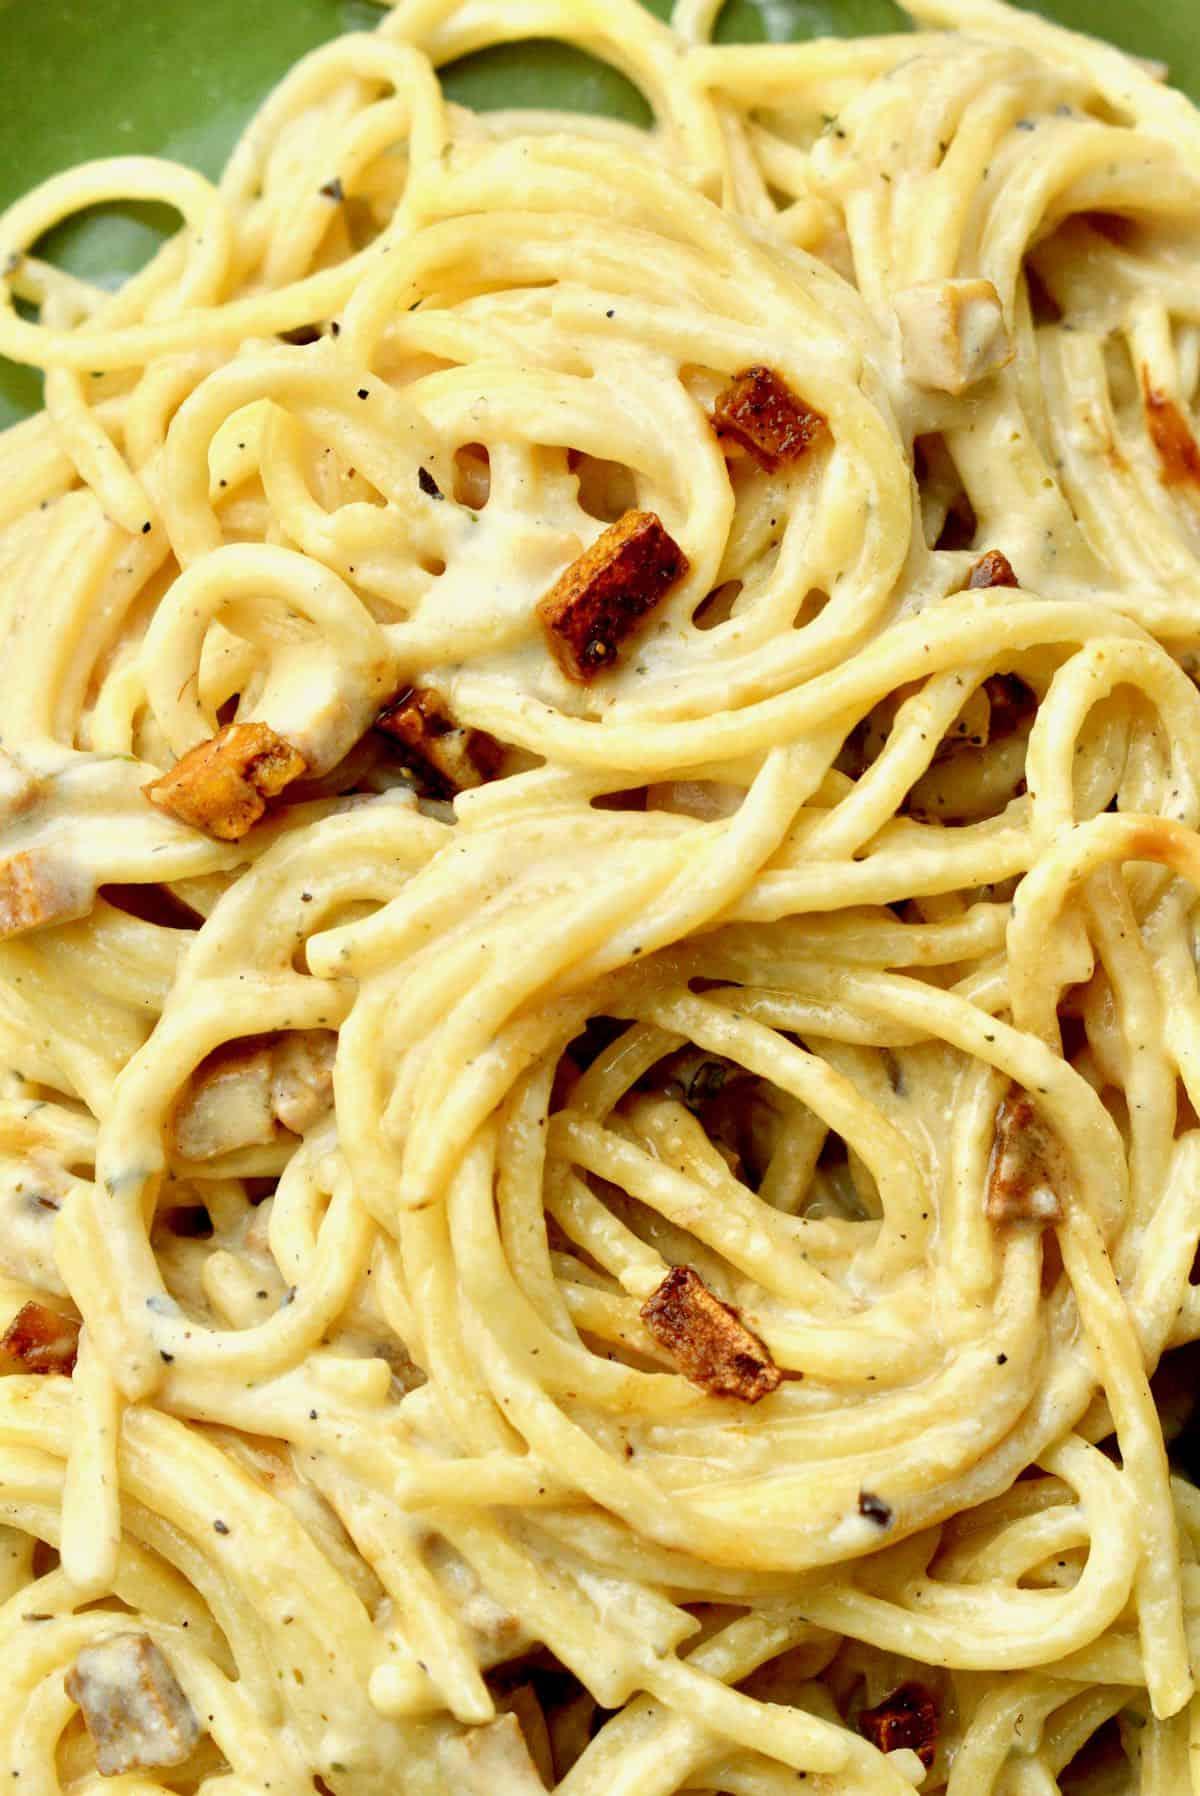 Spaghetti covered in a creamy carbonara sauce